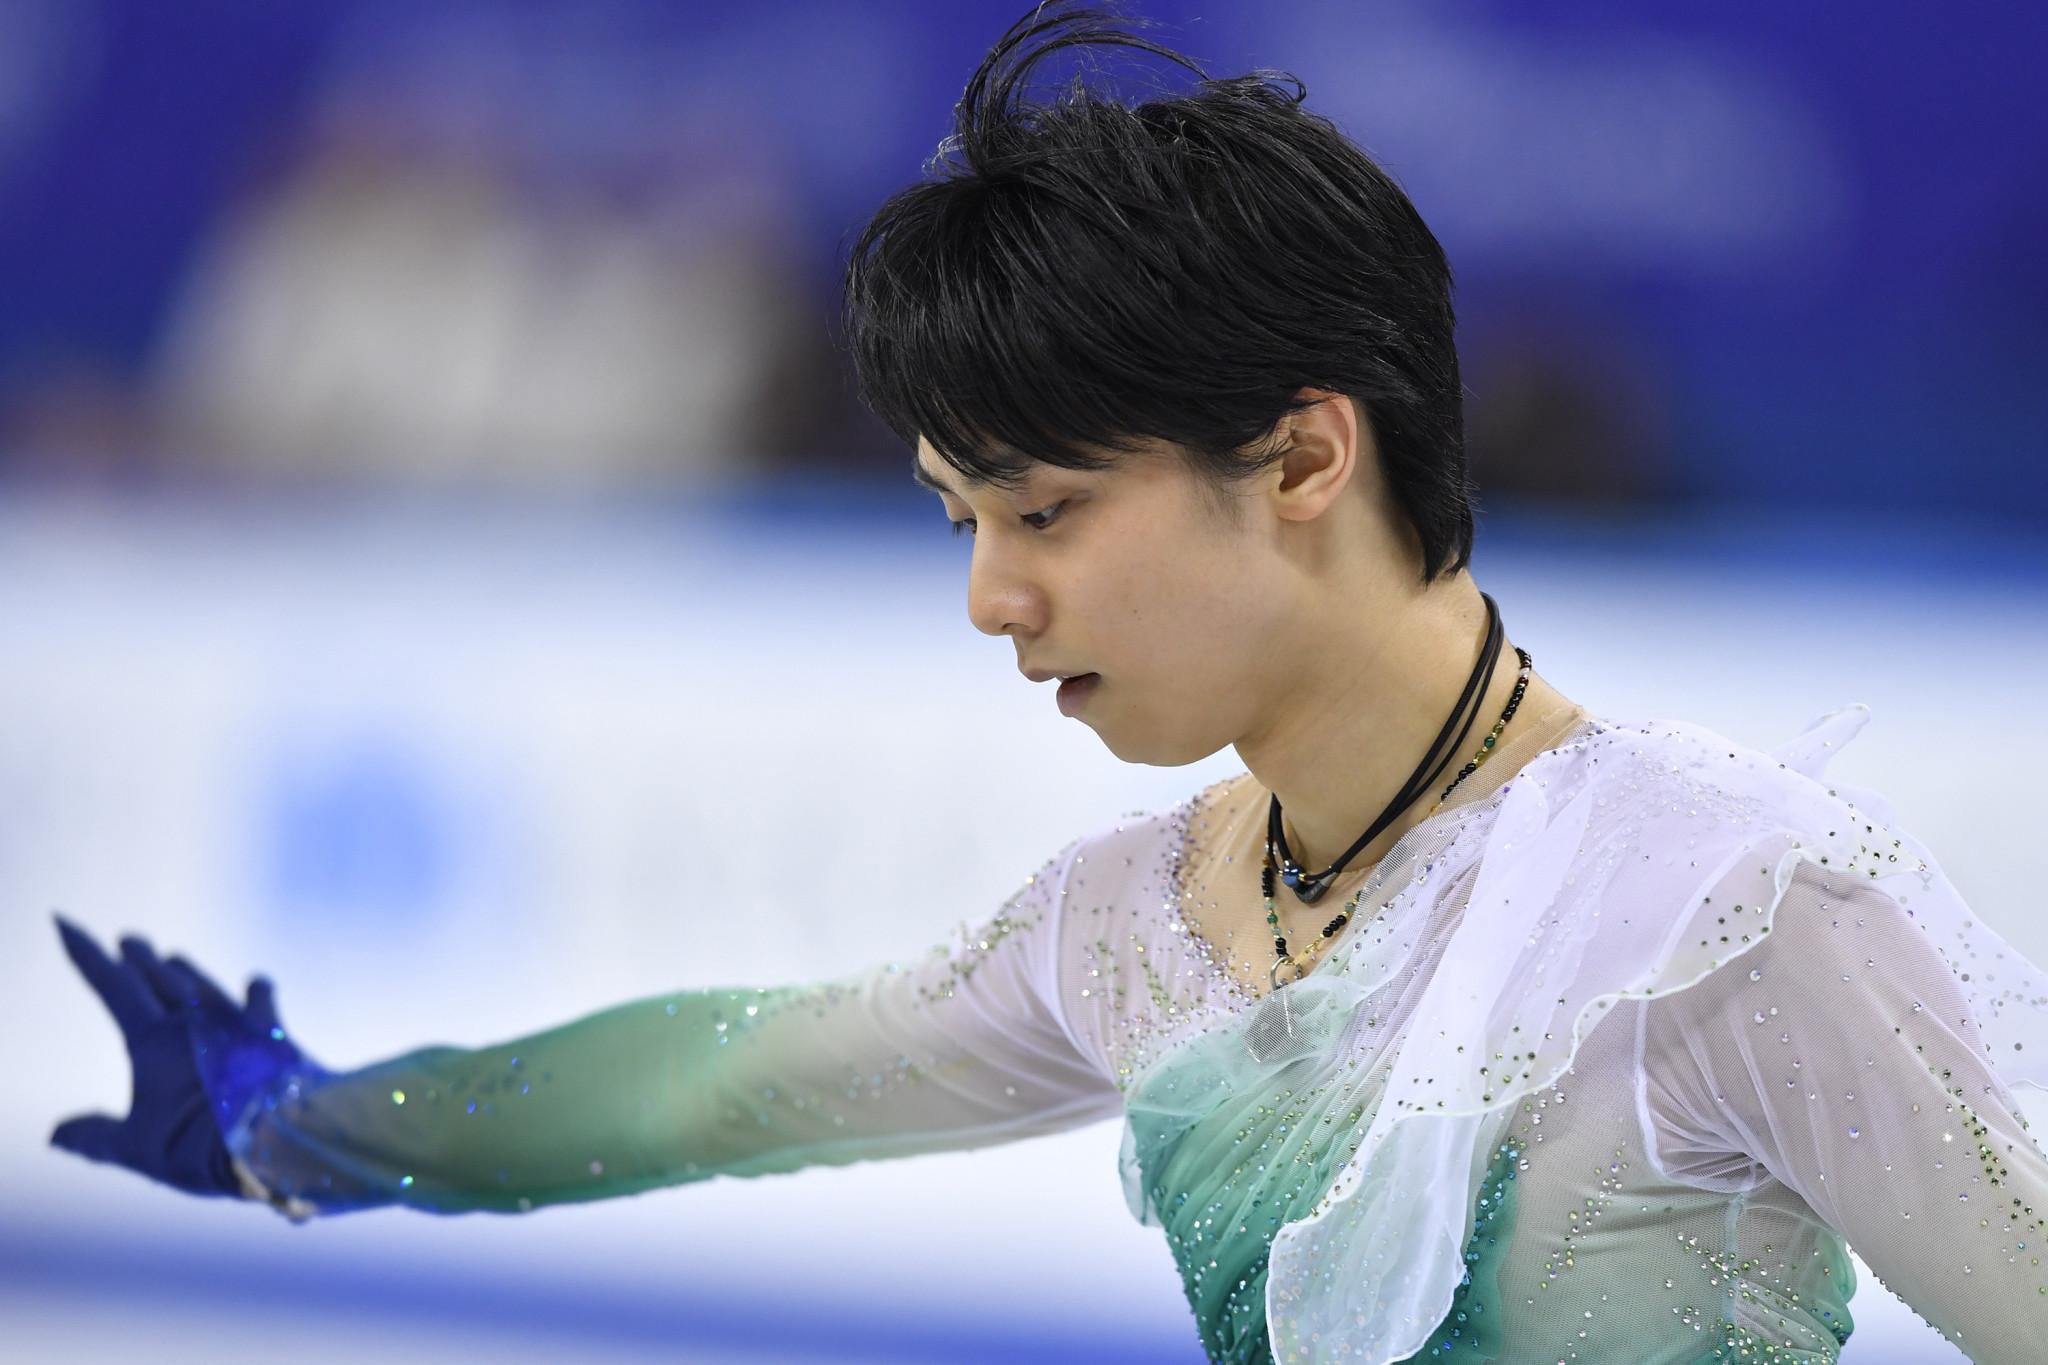 Olympic and world champion Hanyu an injury doubt for ISU Grand Prix of Figure Skating in Osaka